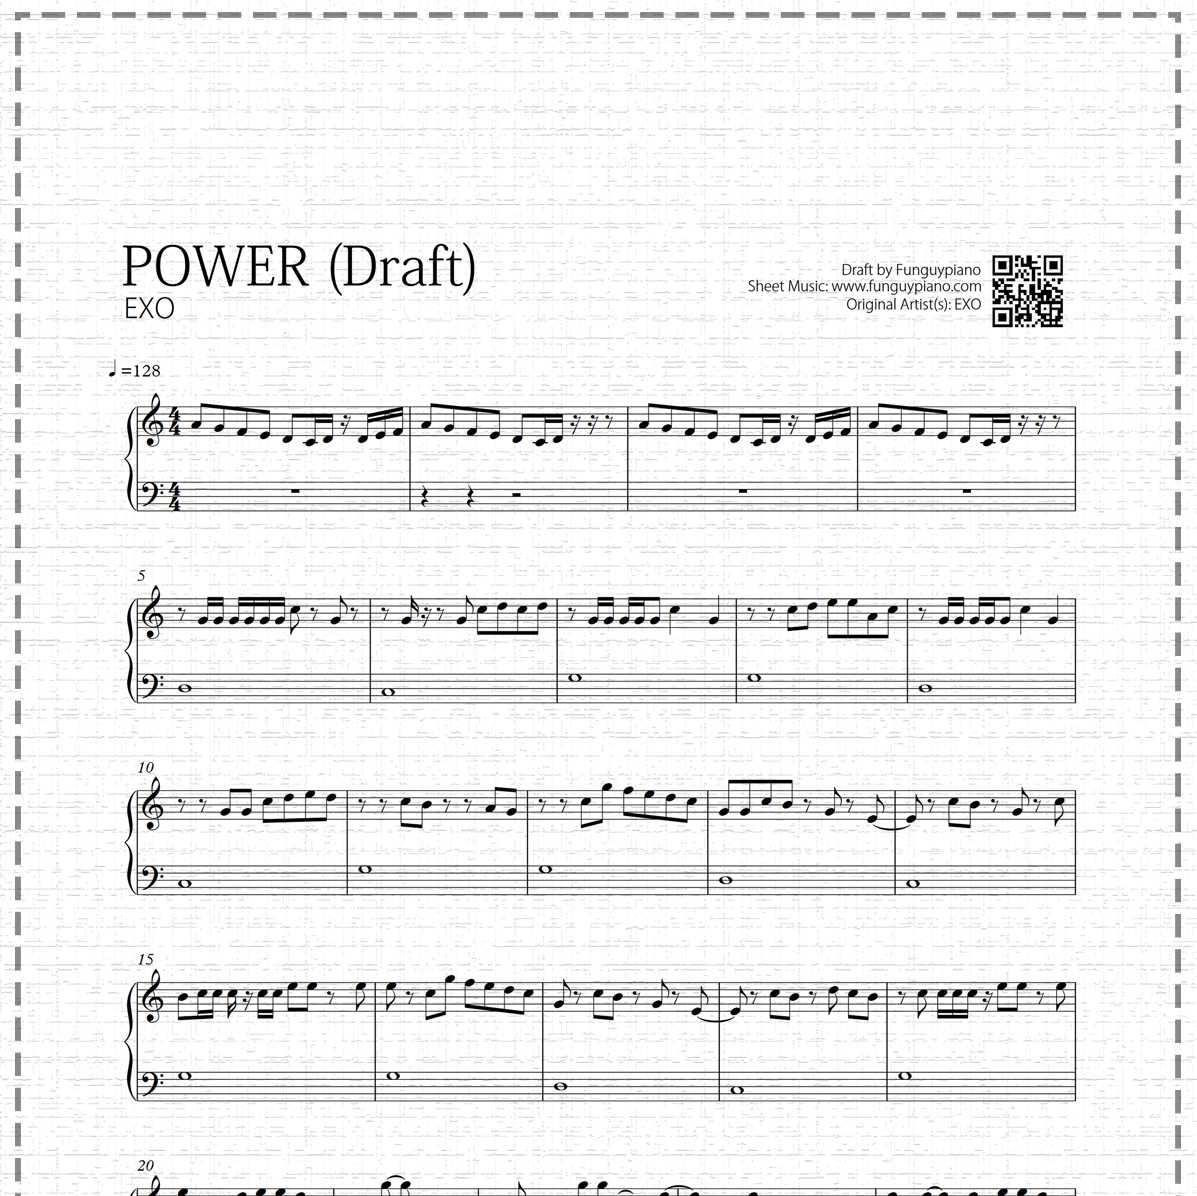 EXO - Power (Draft)